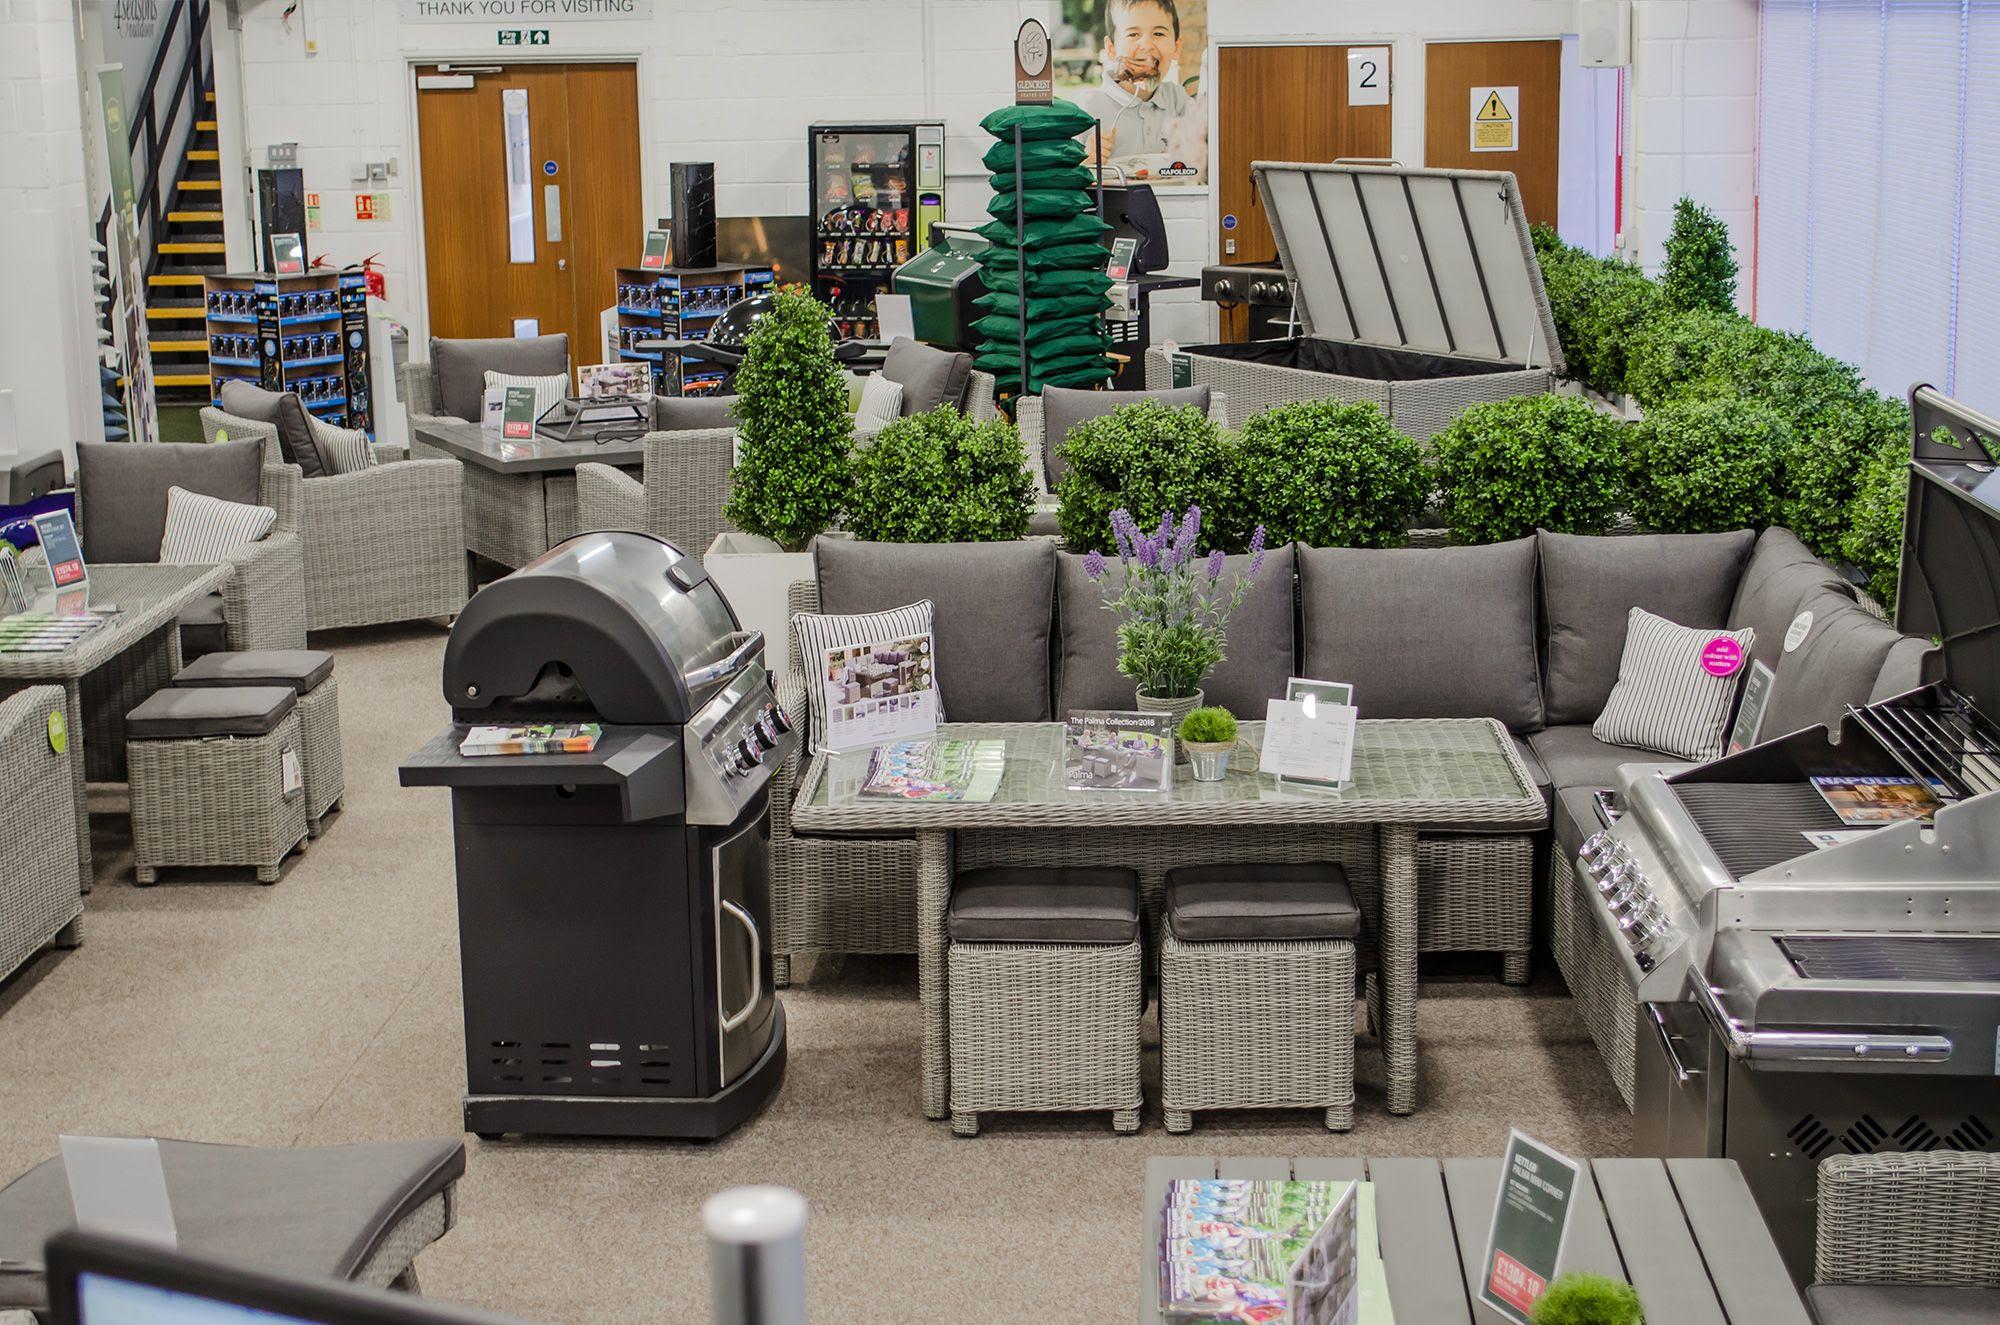 Rattan Garden Furniture Essex - Visit Our Showroom